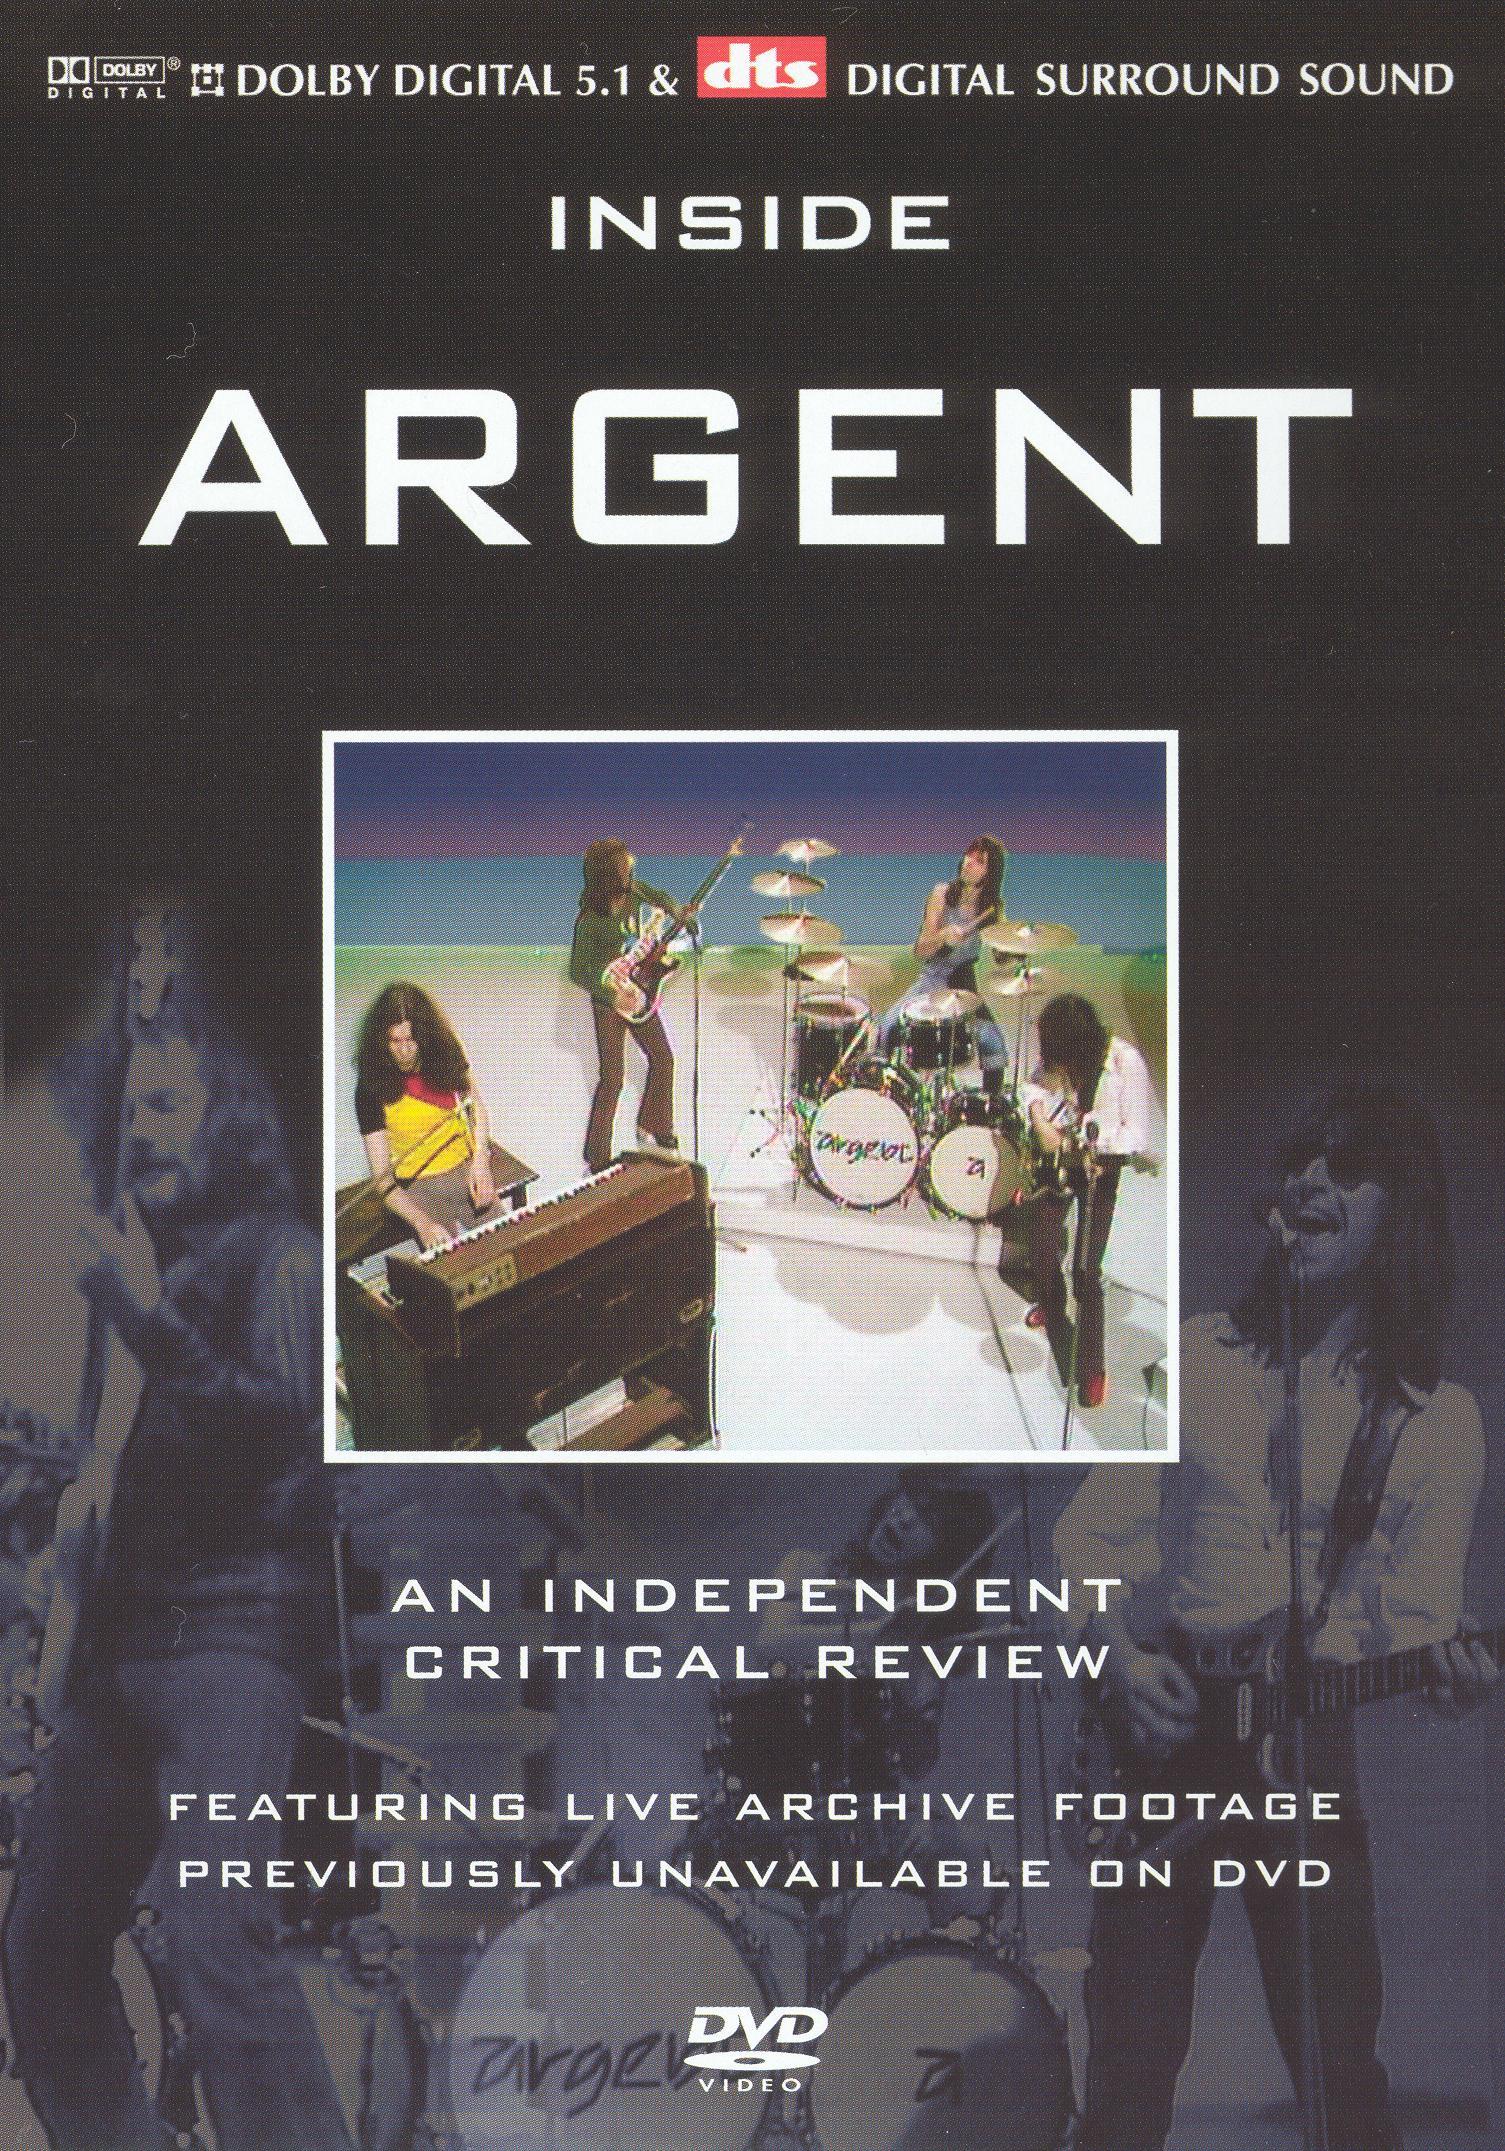 Inside Argent: A Critical Review